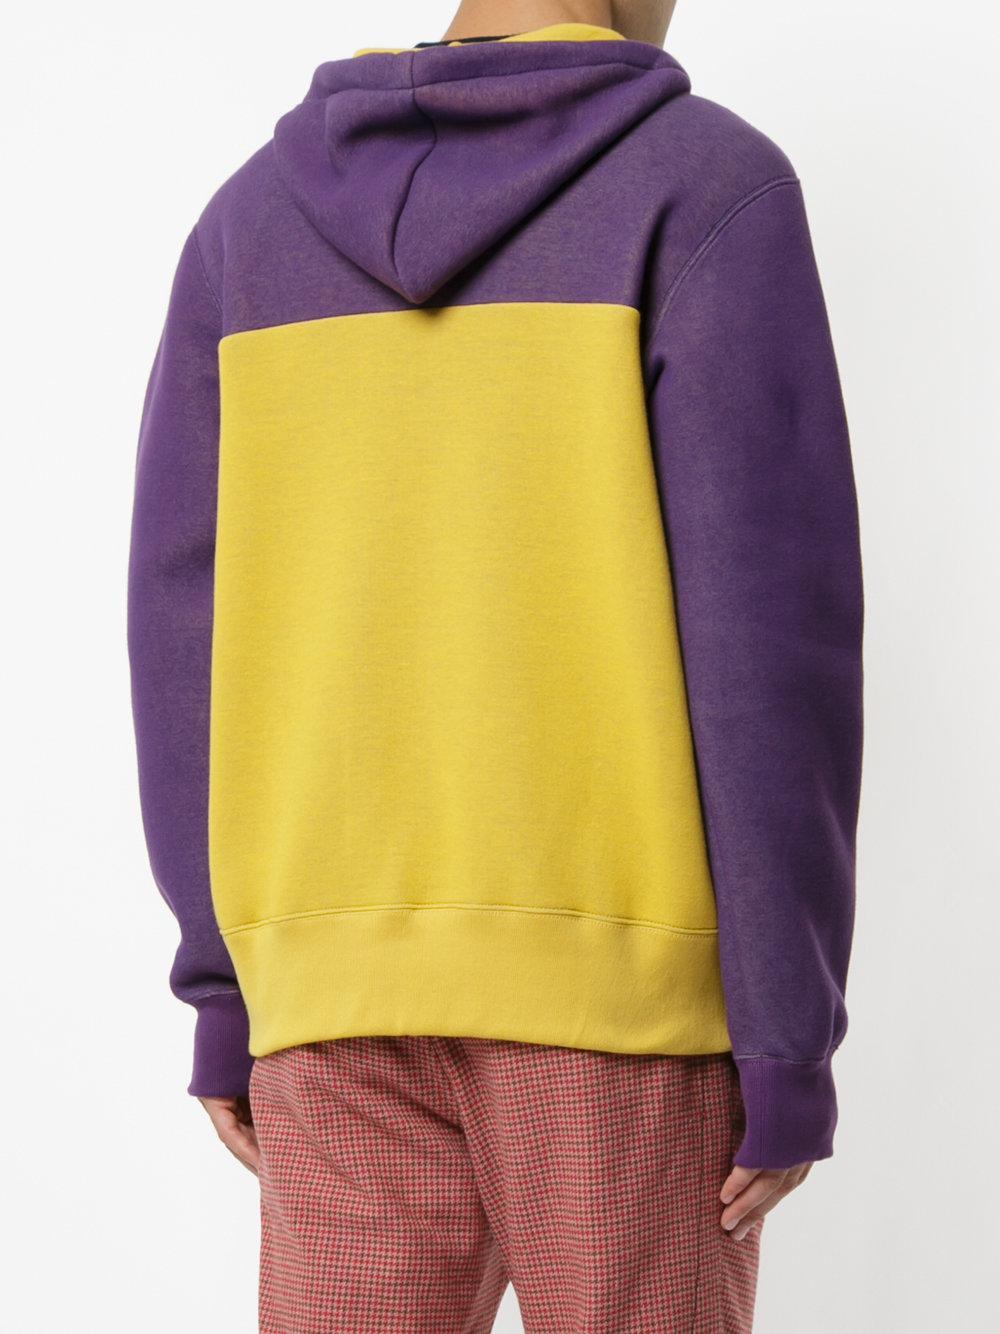 Sacai Cotton Colour Blocked Hoodie in Yellow & Orange (Yellow) for Men